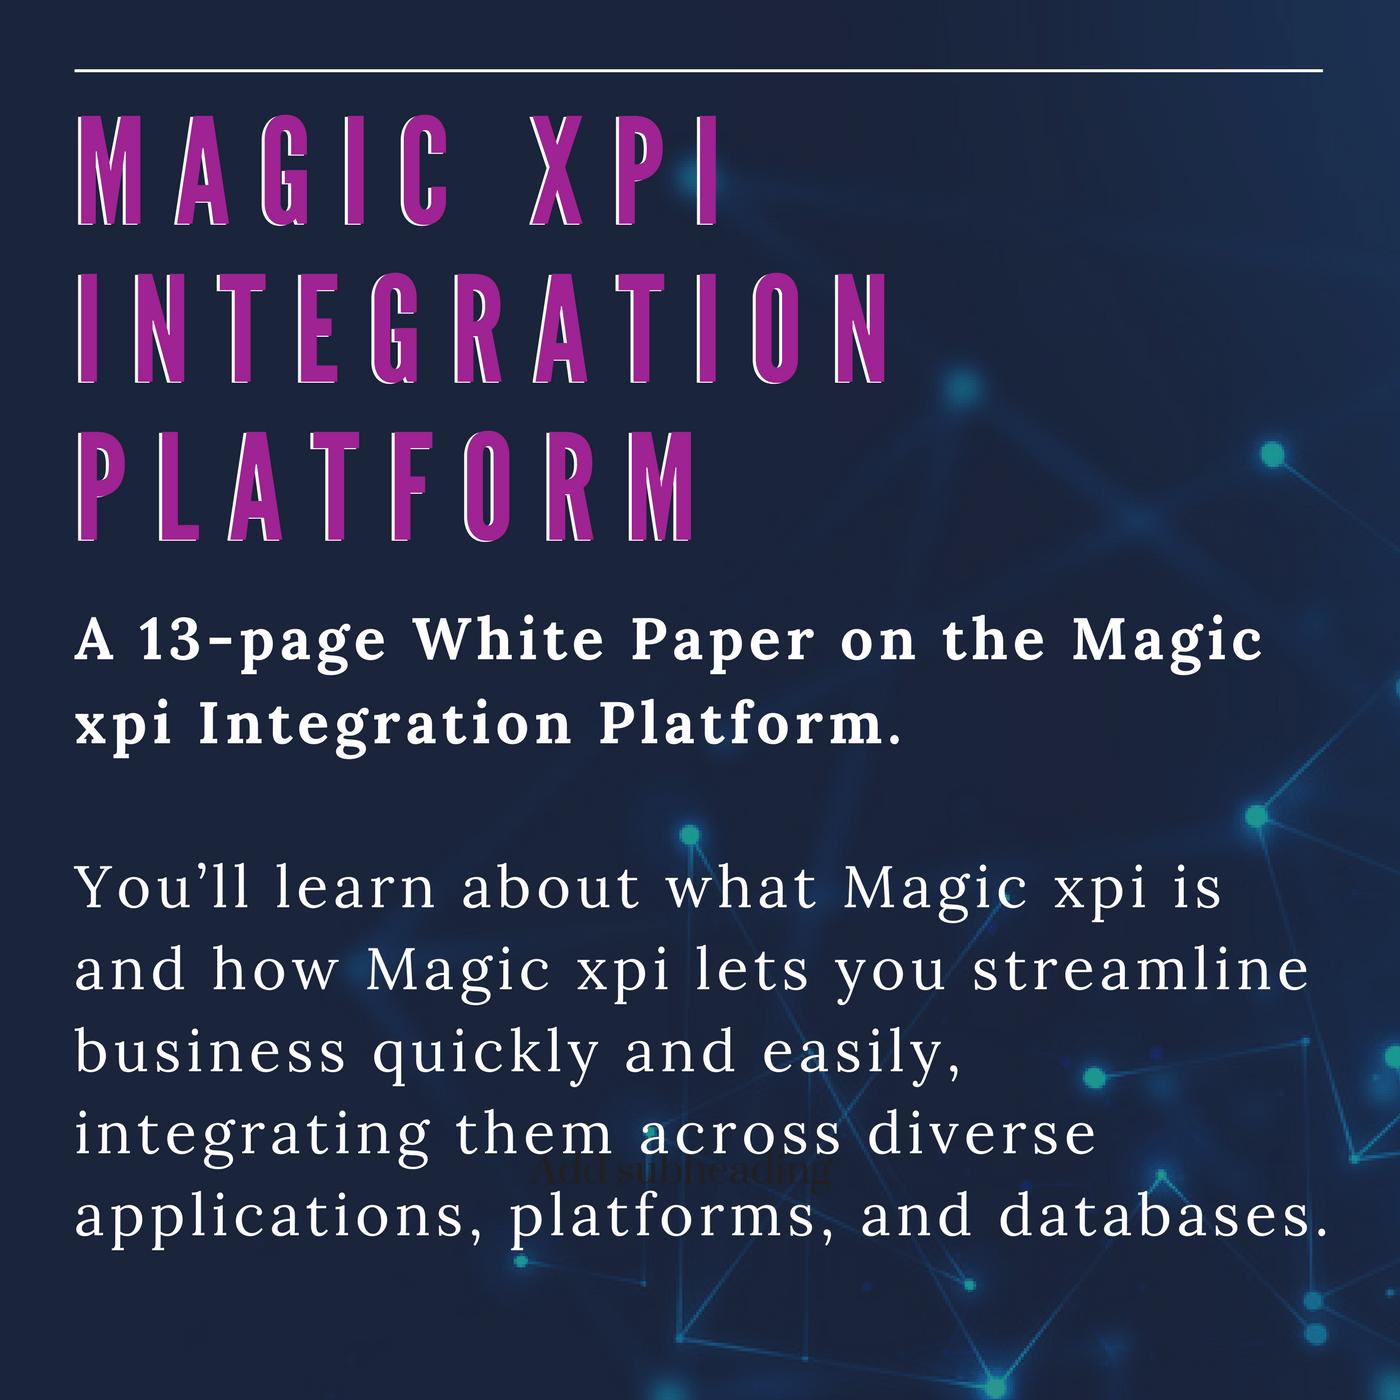 Magic xpi Integration SOA platform White paper